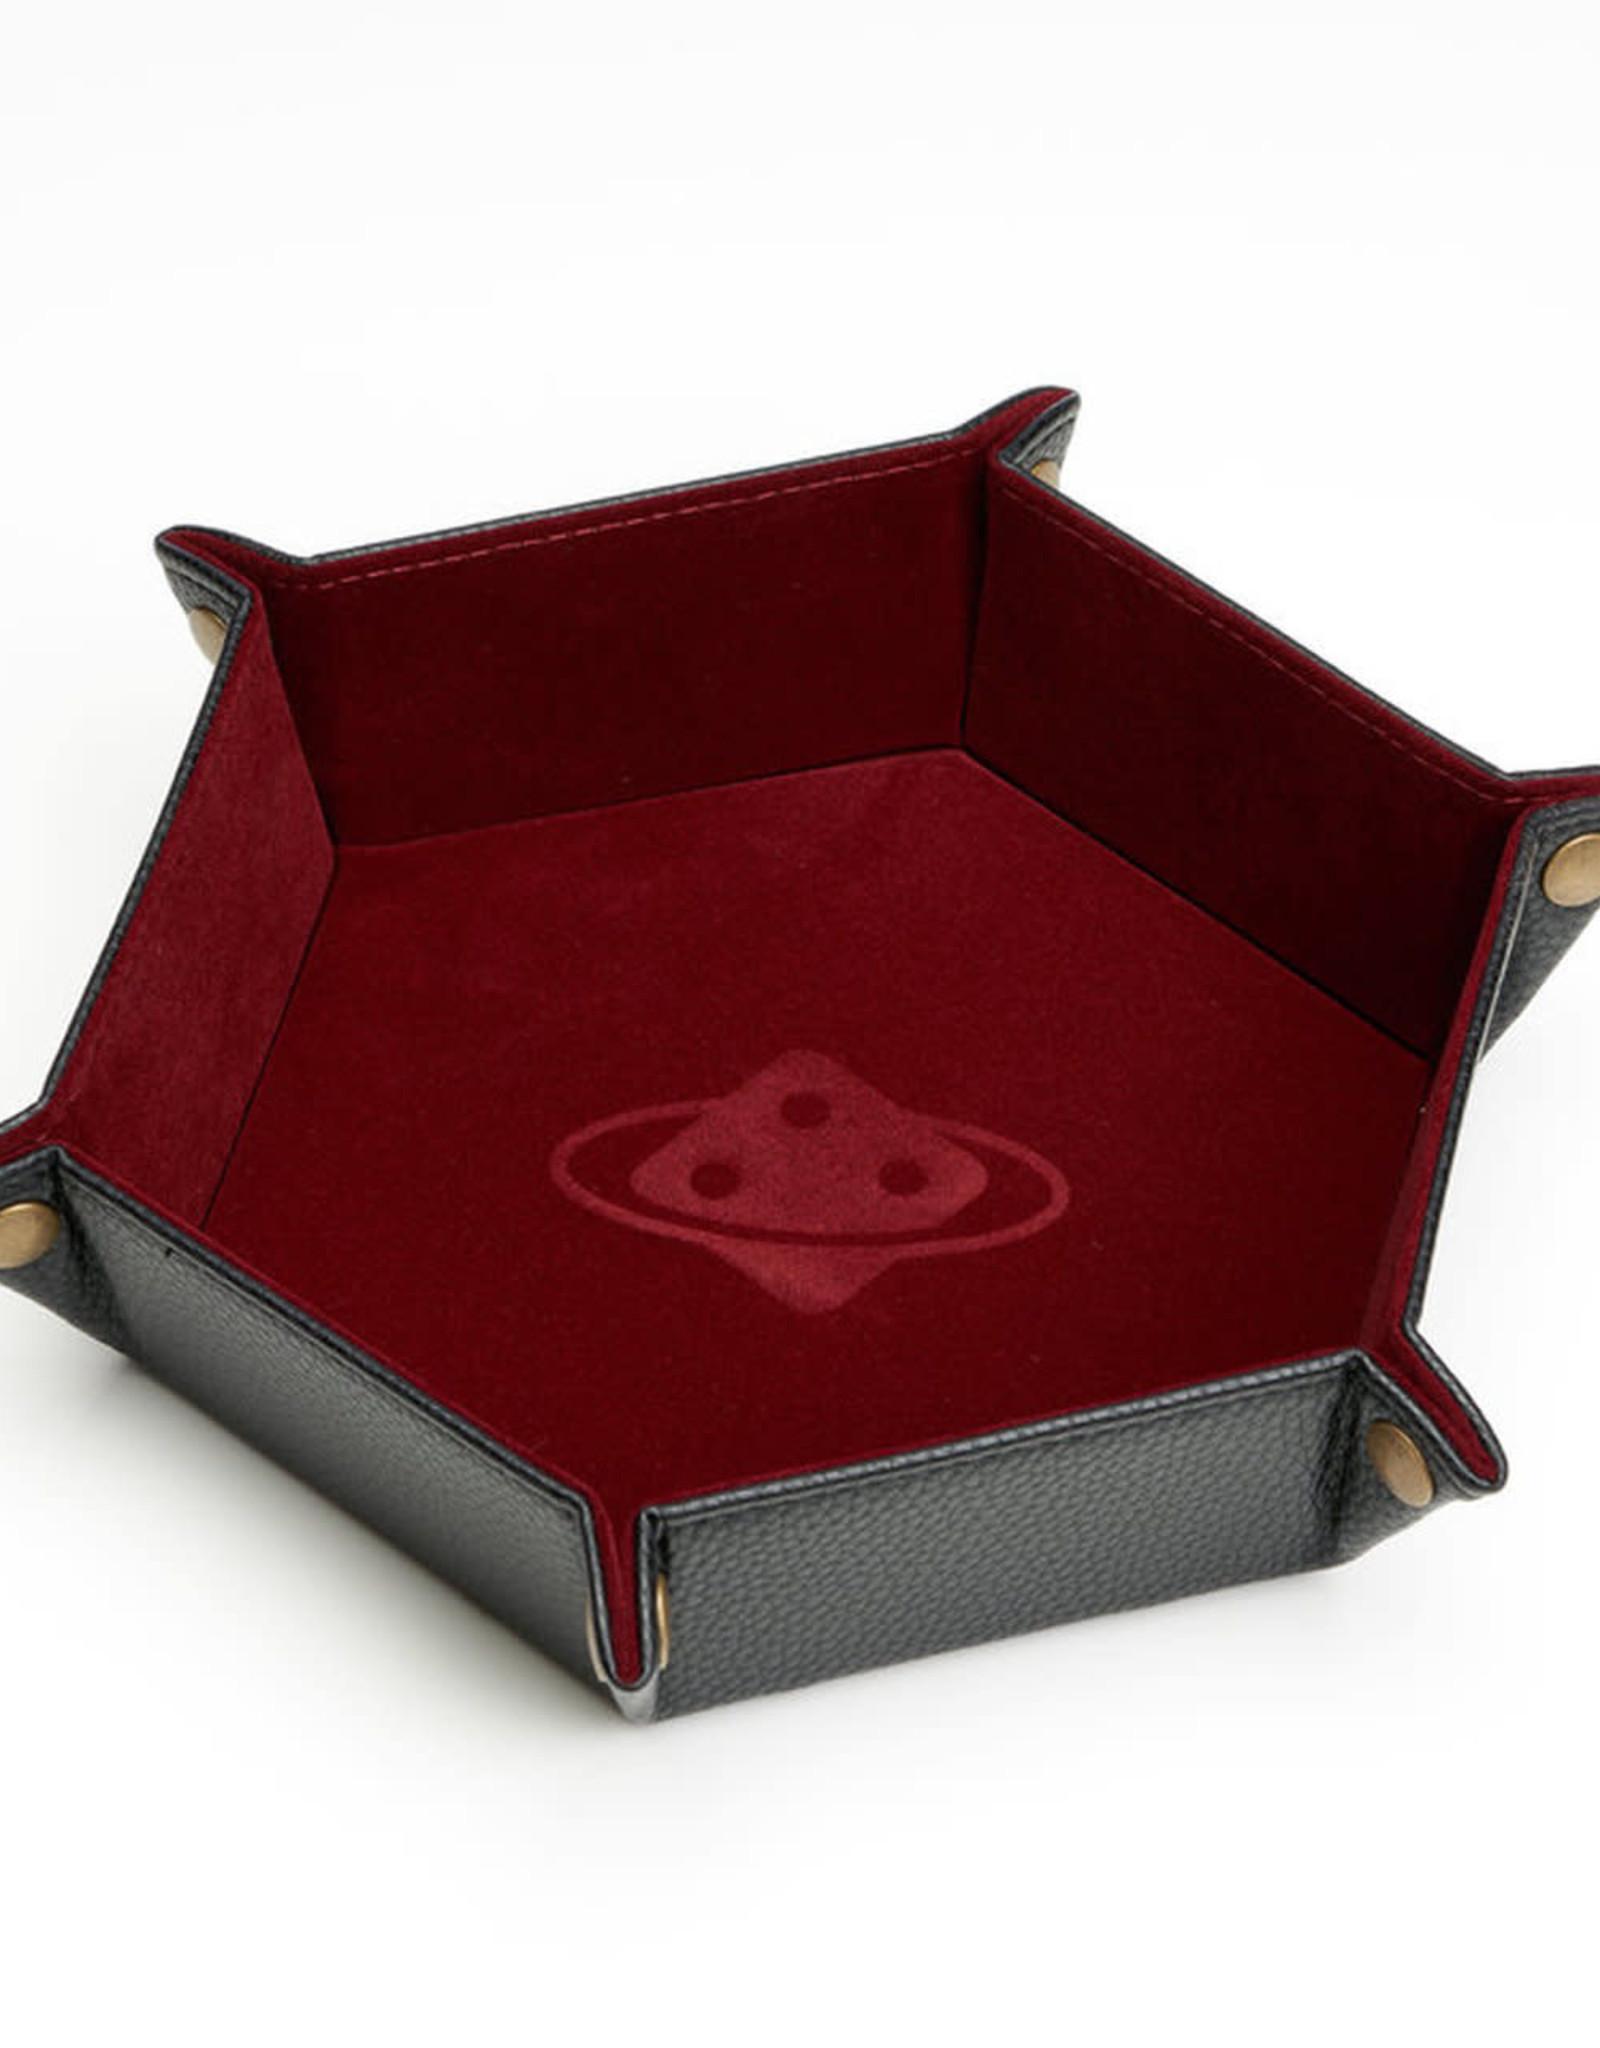 Dice Tray: Hexagon, Folding - Burgundy, Brass Buttons